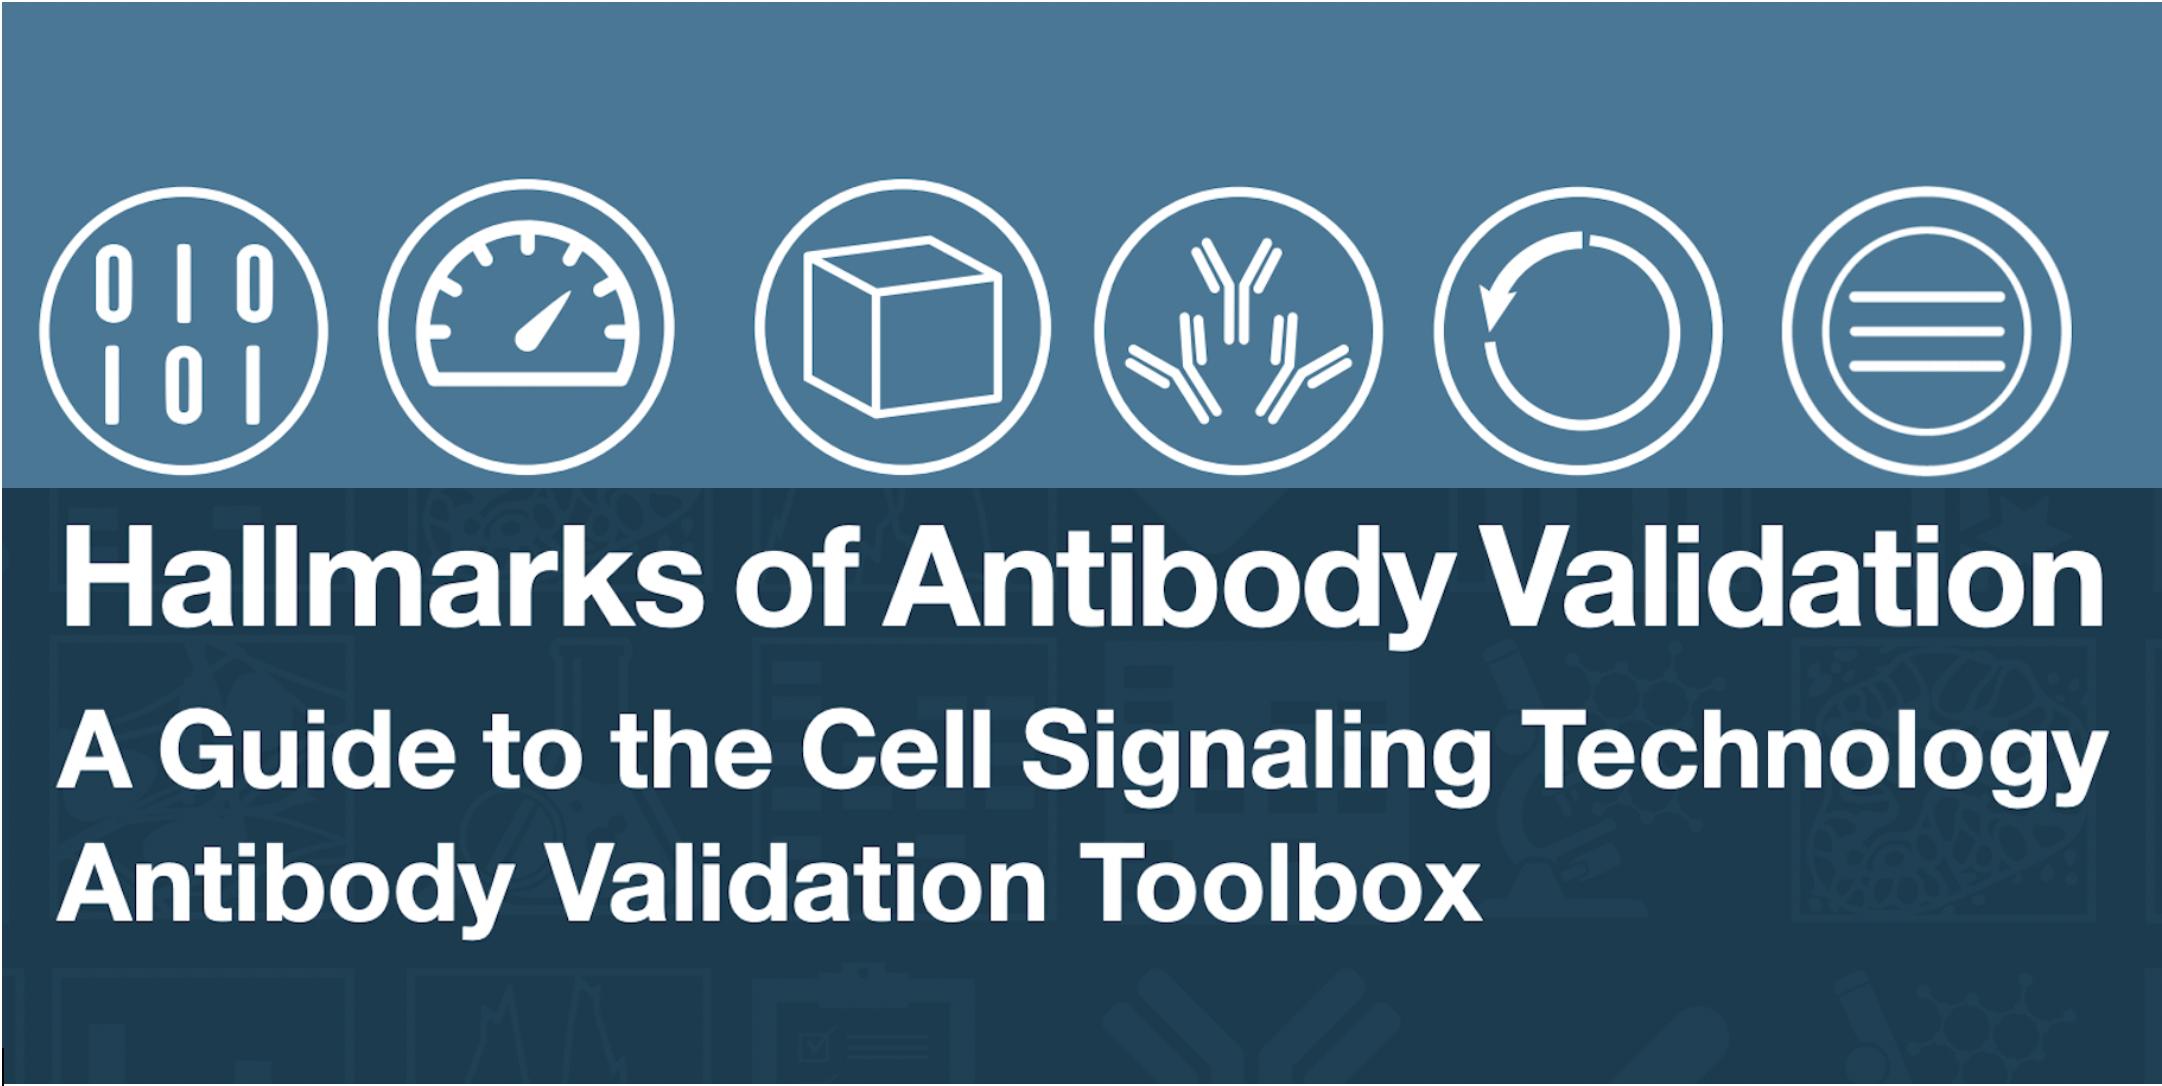 Hallmarks of Antibody Validation Overview